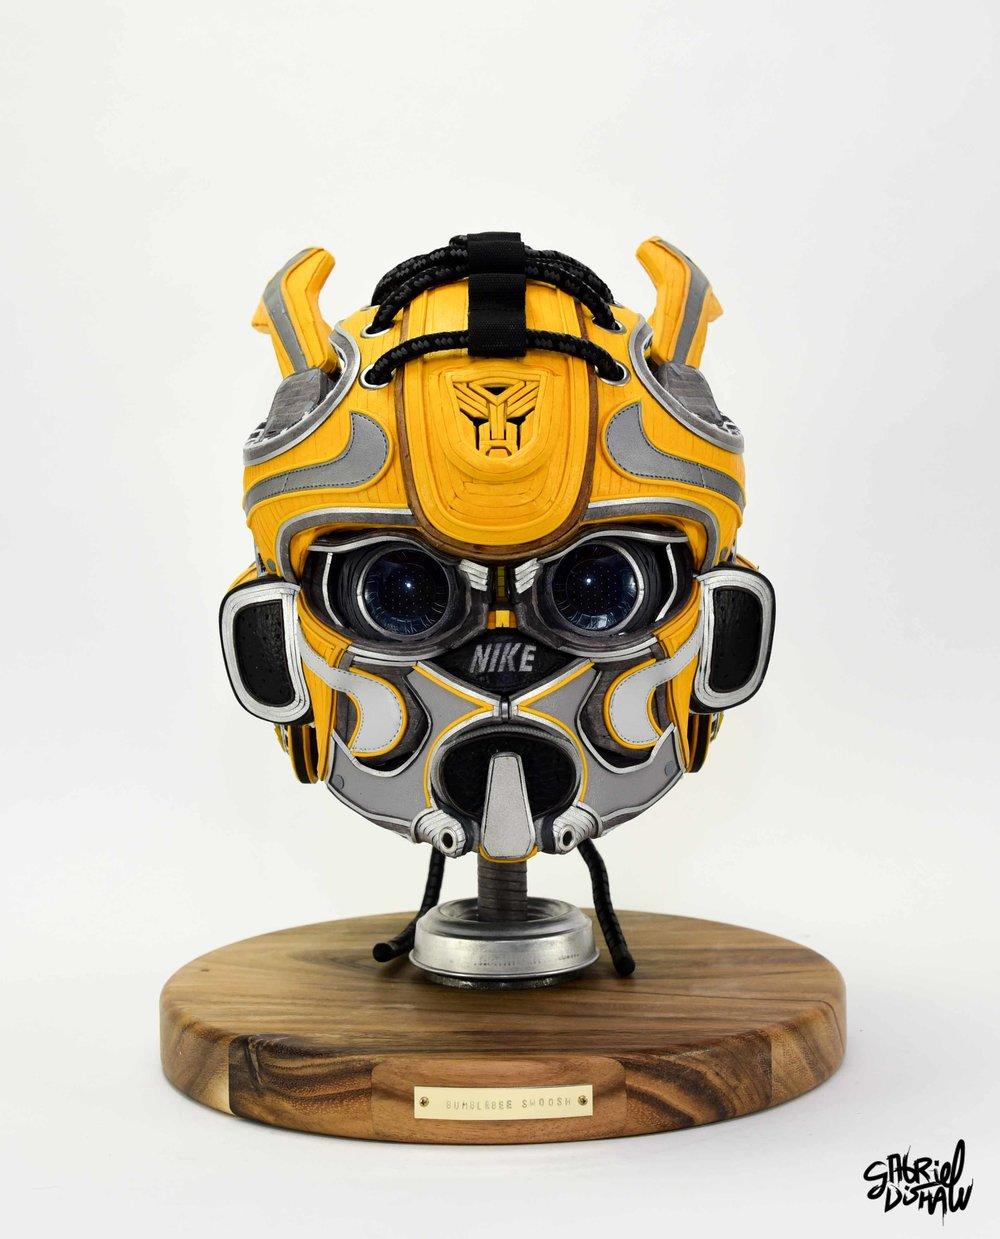 Gabriel Dishaw Bumblebee Swoosh-8334.jpg